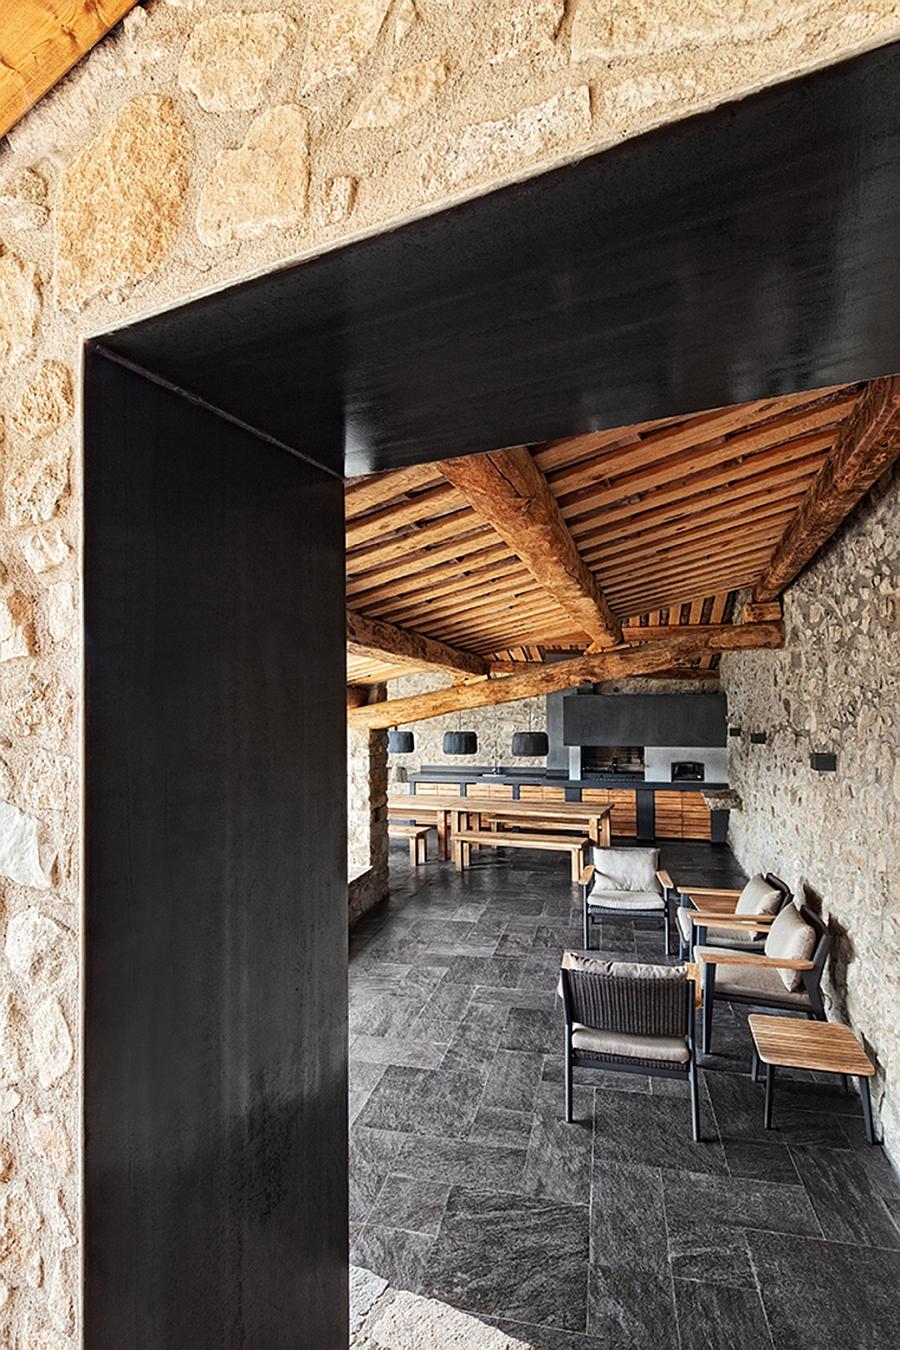 Renovated Spanish home has a beuatiful indoor-outdoor interplay